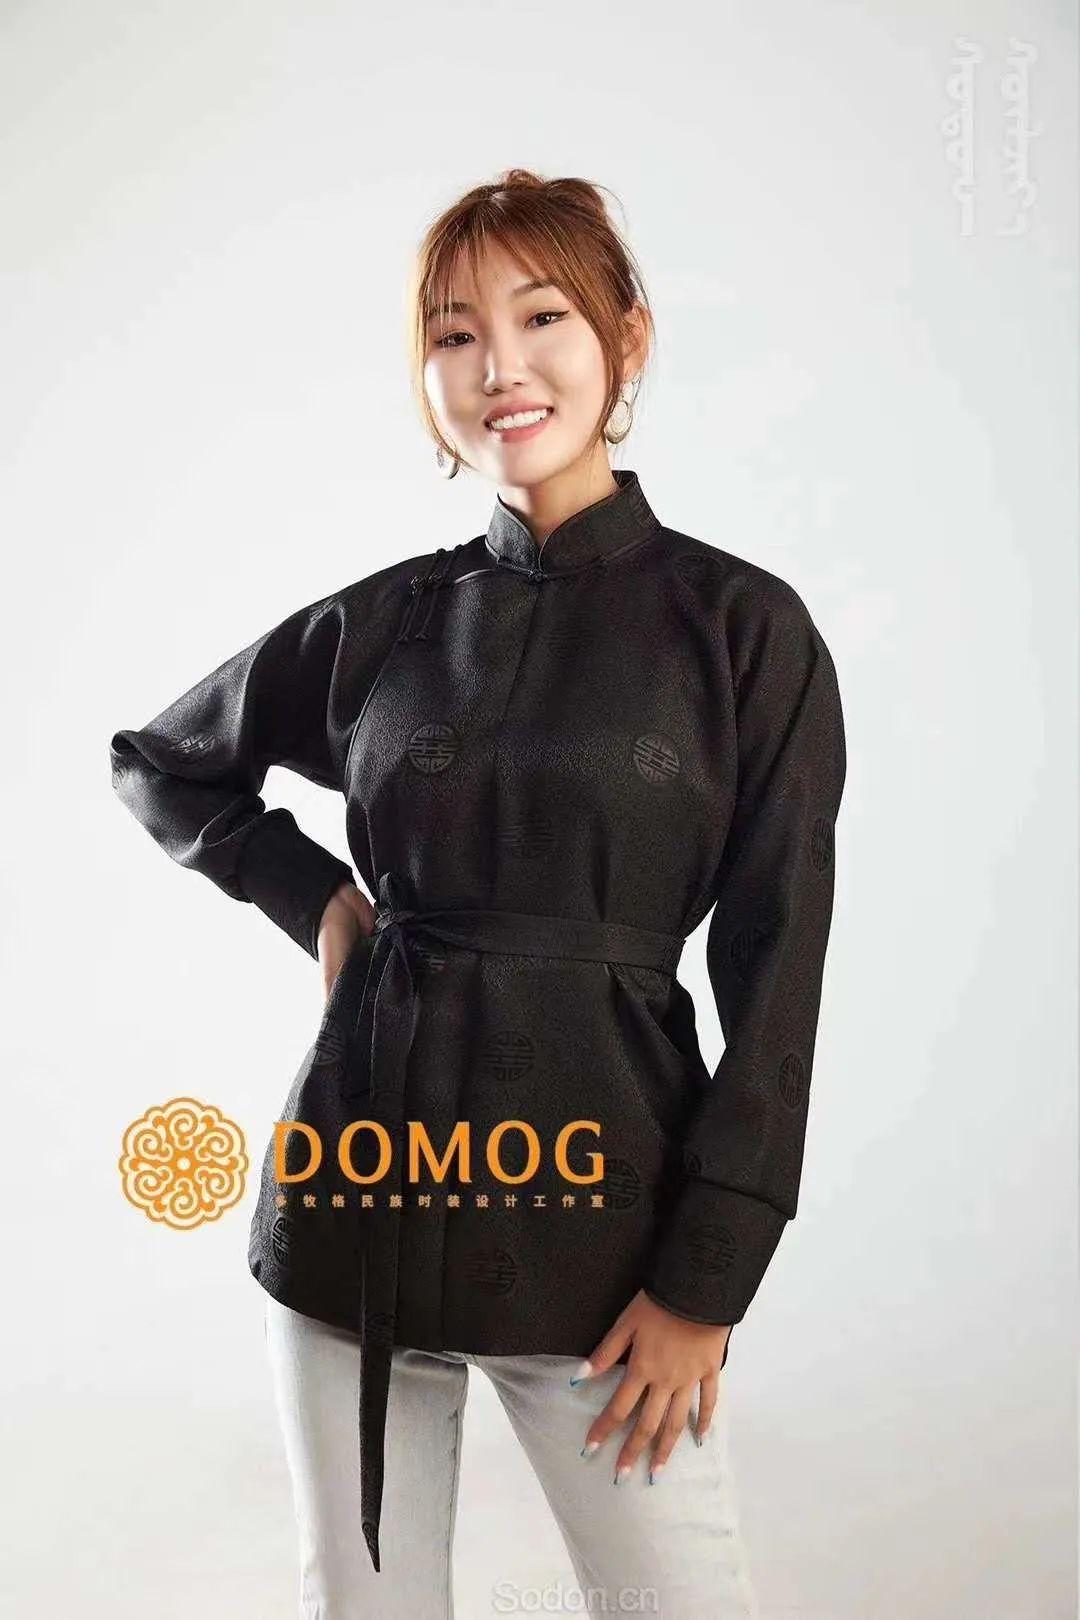 DOMOG 蒙古时装2020新款,民族与时尚的融合 第36张 DOMOG 蒙古时装2020新款,民族与时尚的融合 蒙古服饰